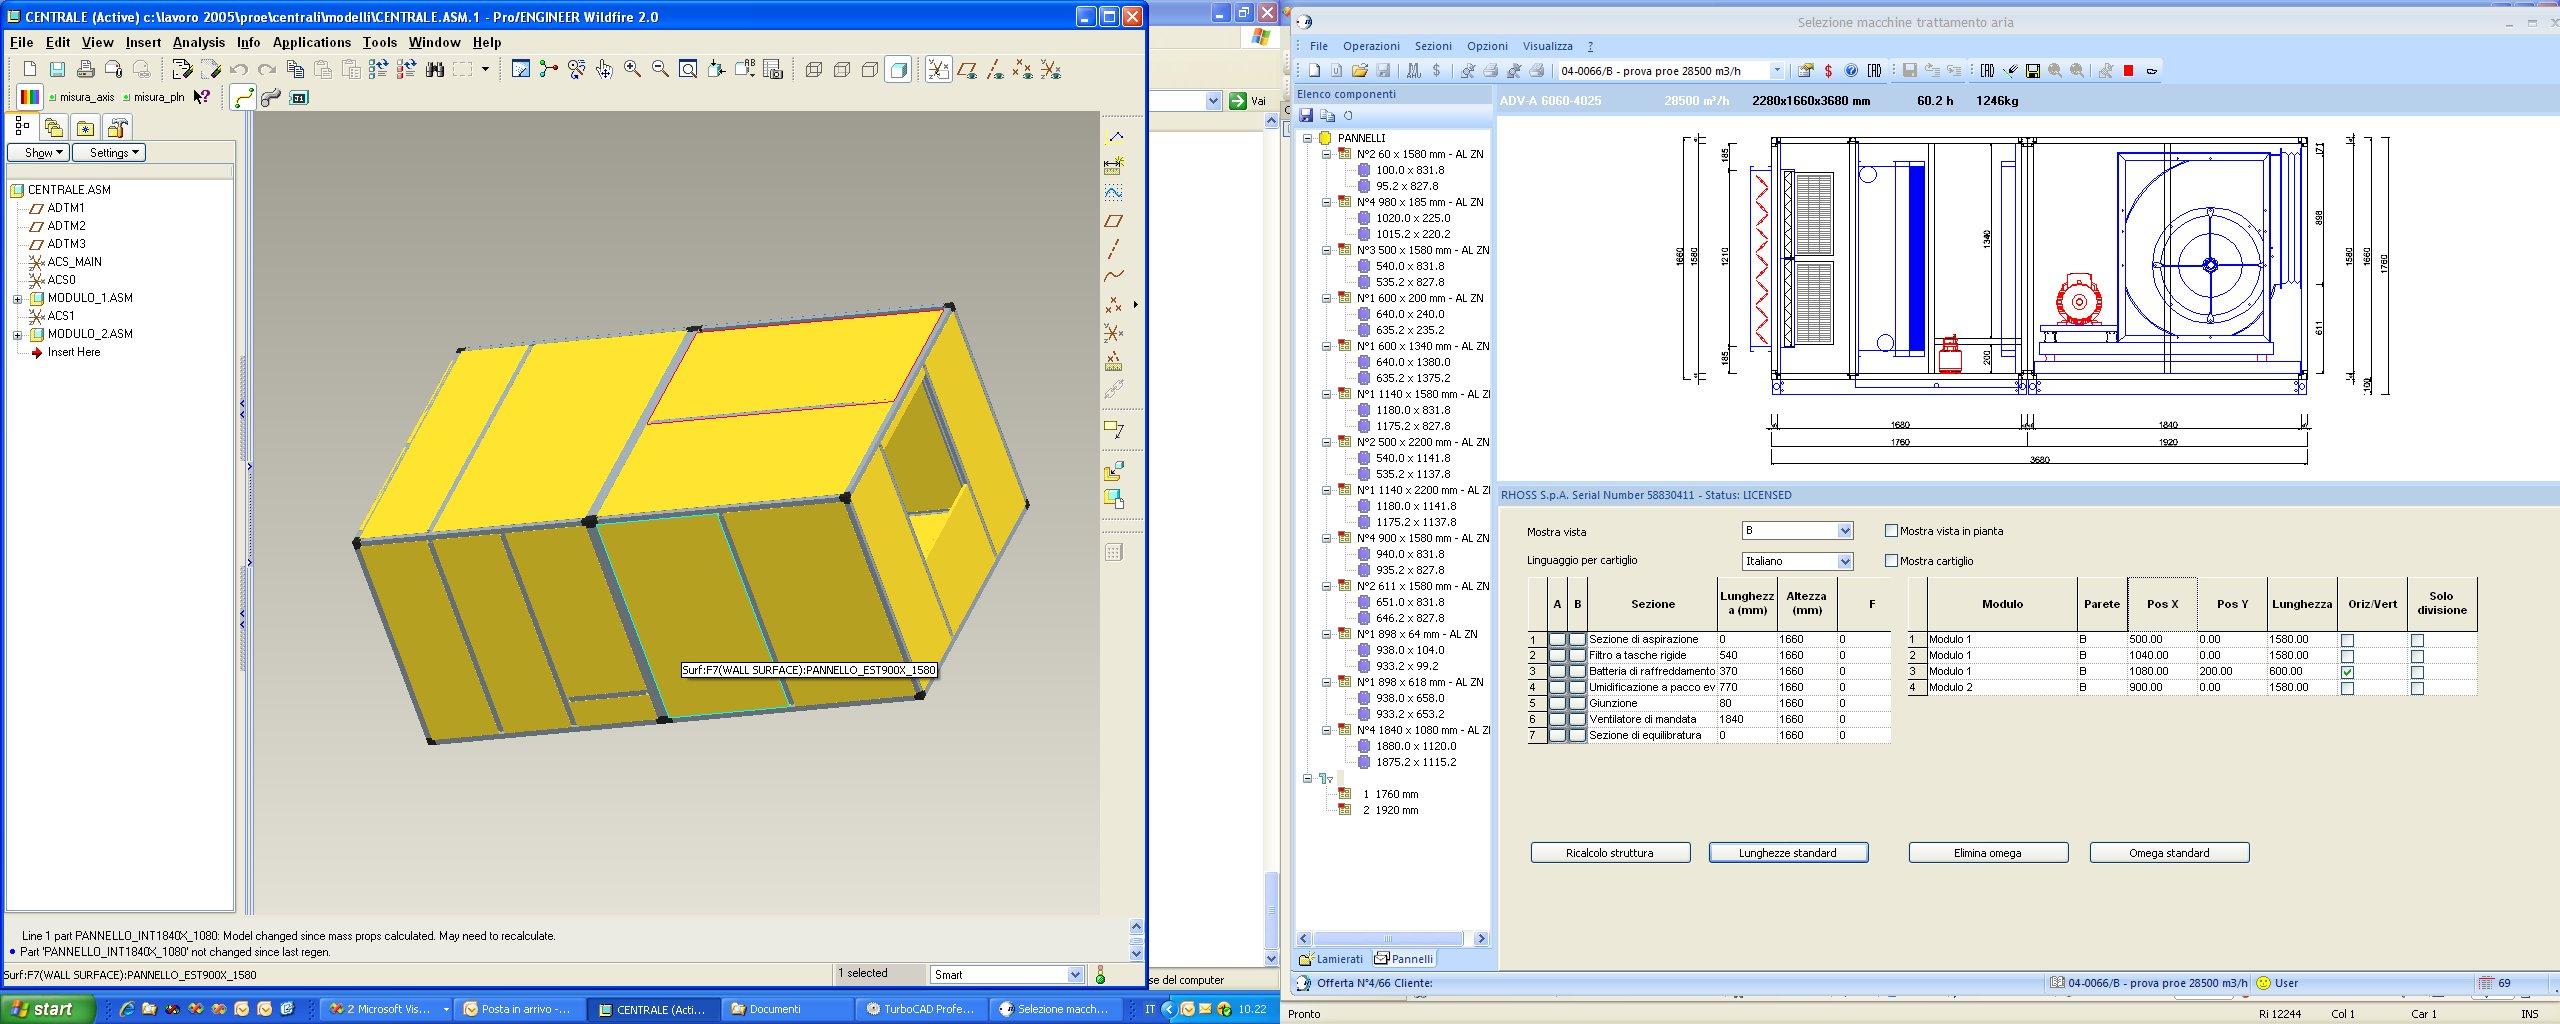 3d Unit Model Ahu Designer Software Diagram Generation Of A The Structure